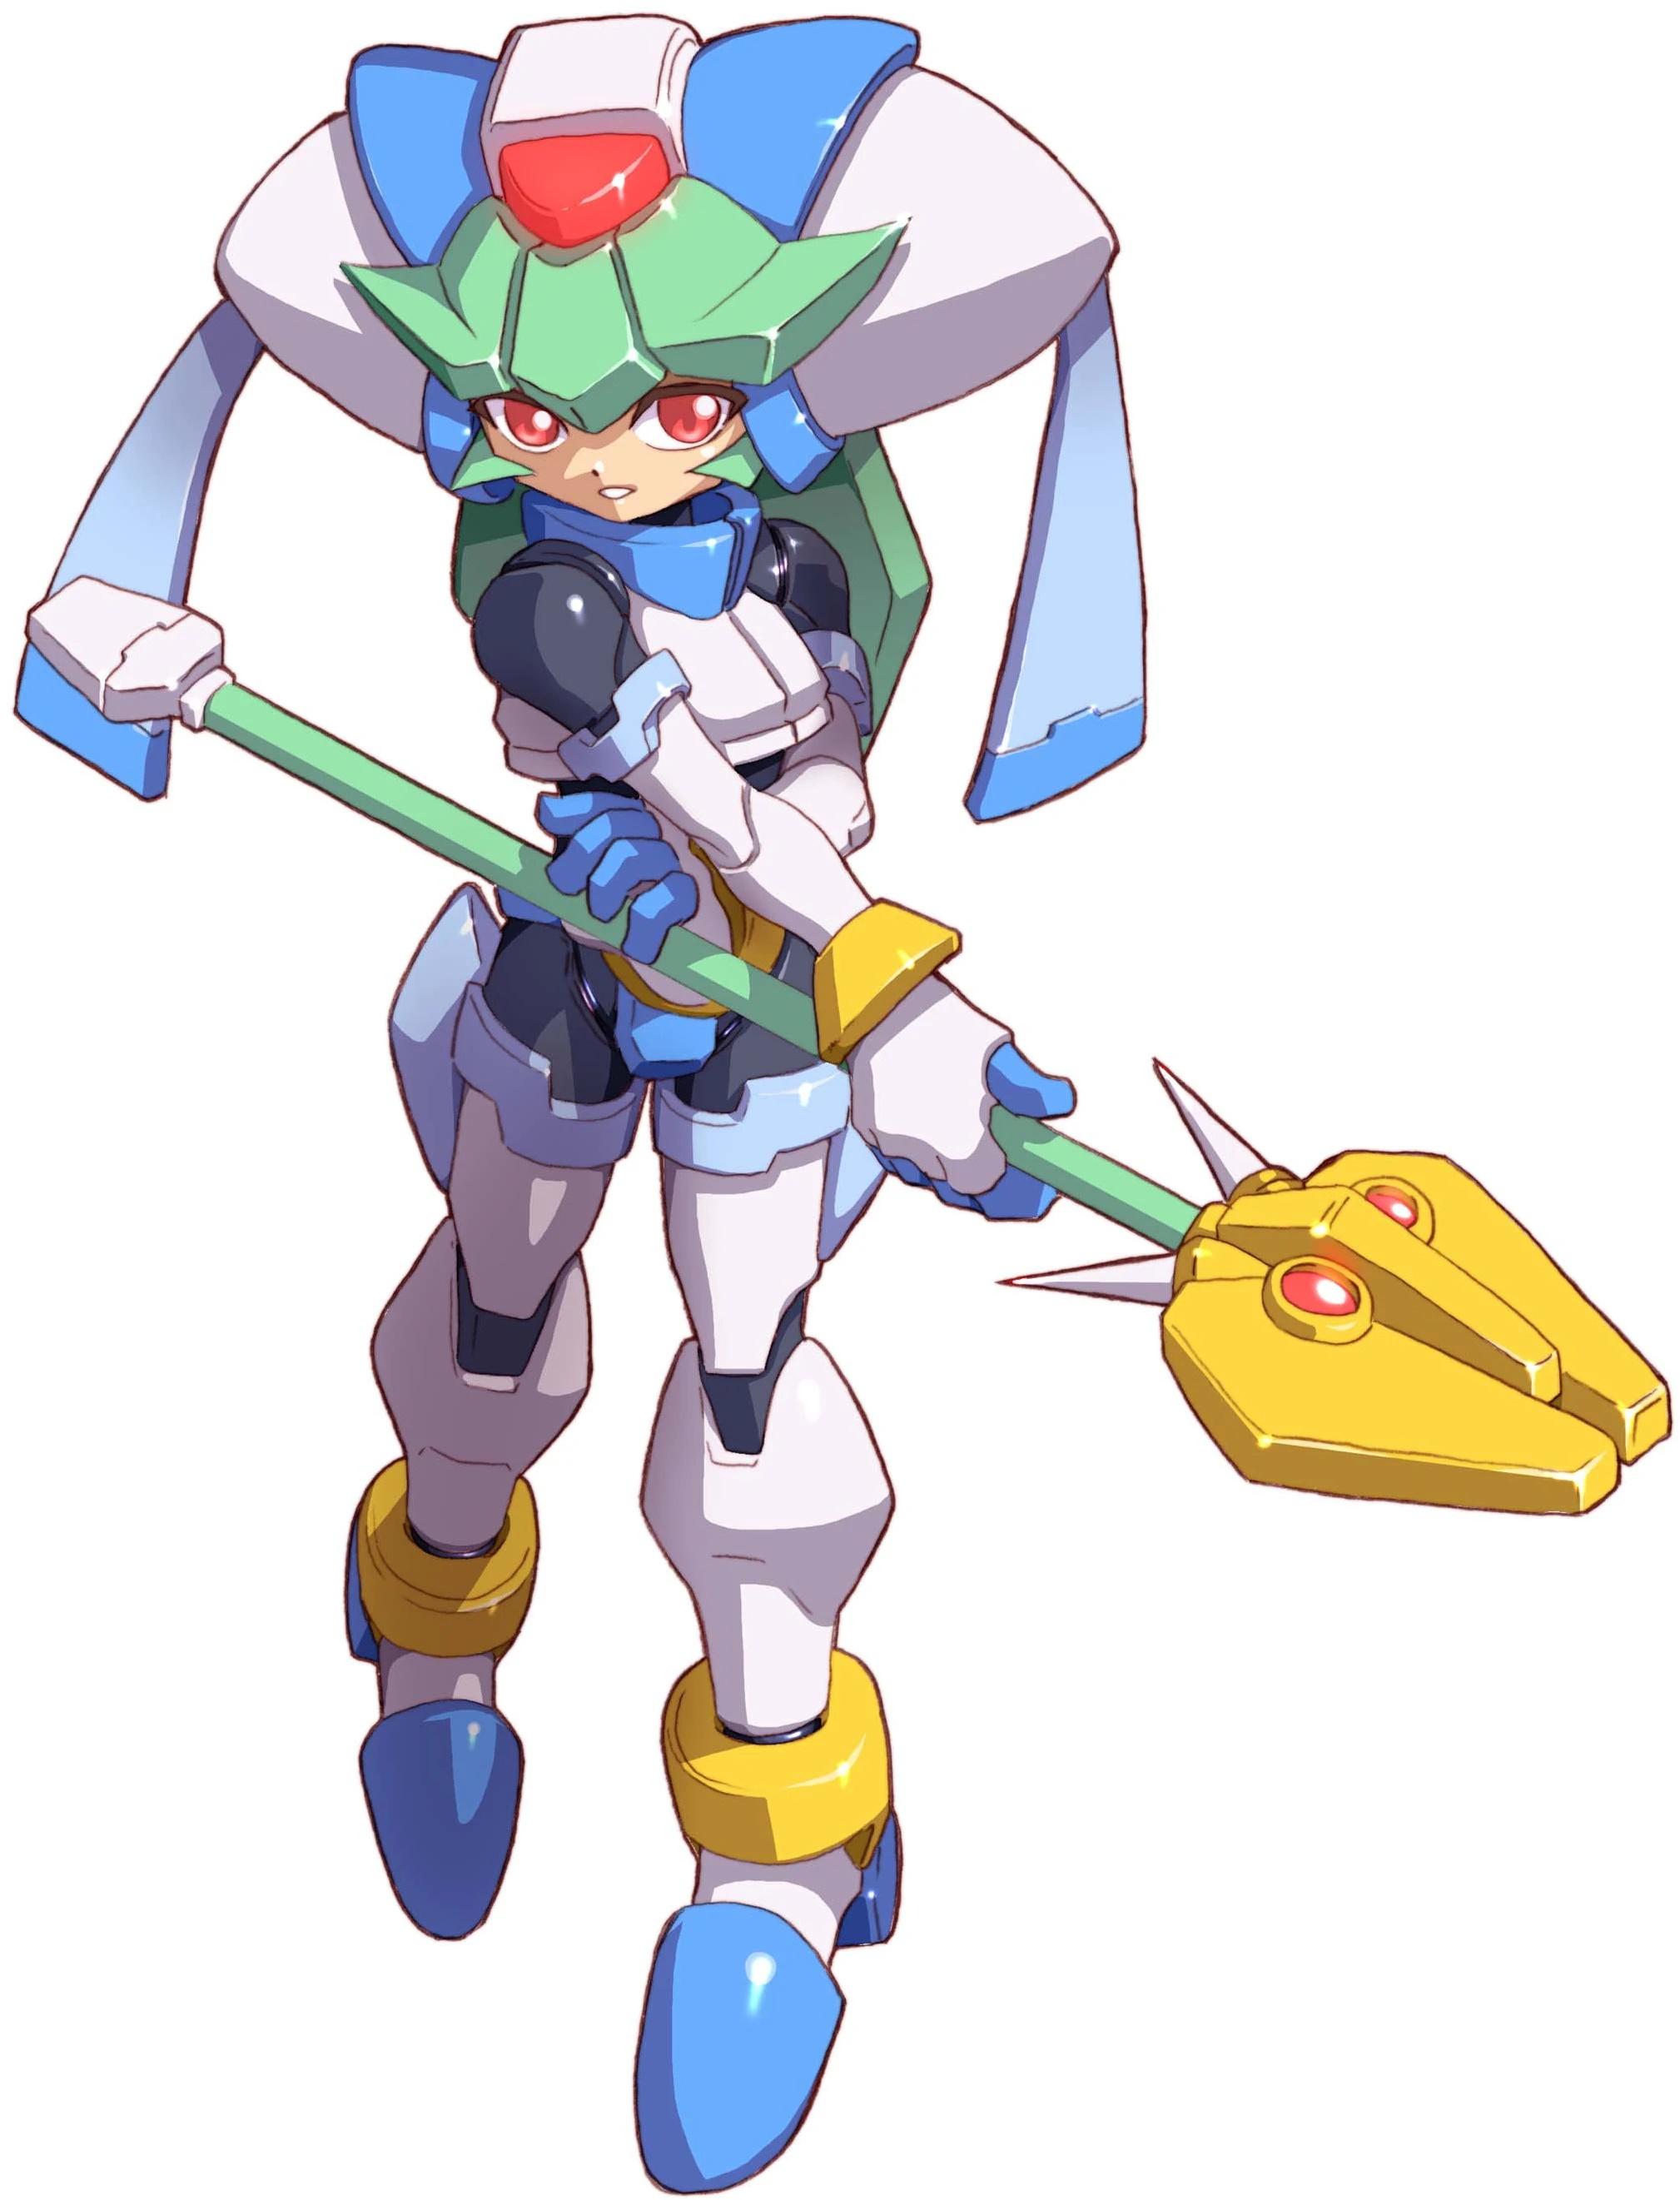 Pandora mega man hq fandom powered by wikia - Megaman wikia ...